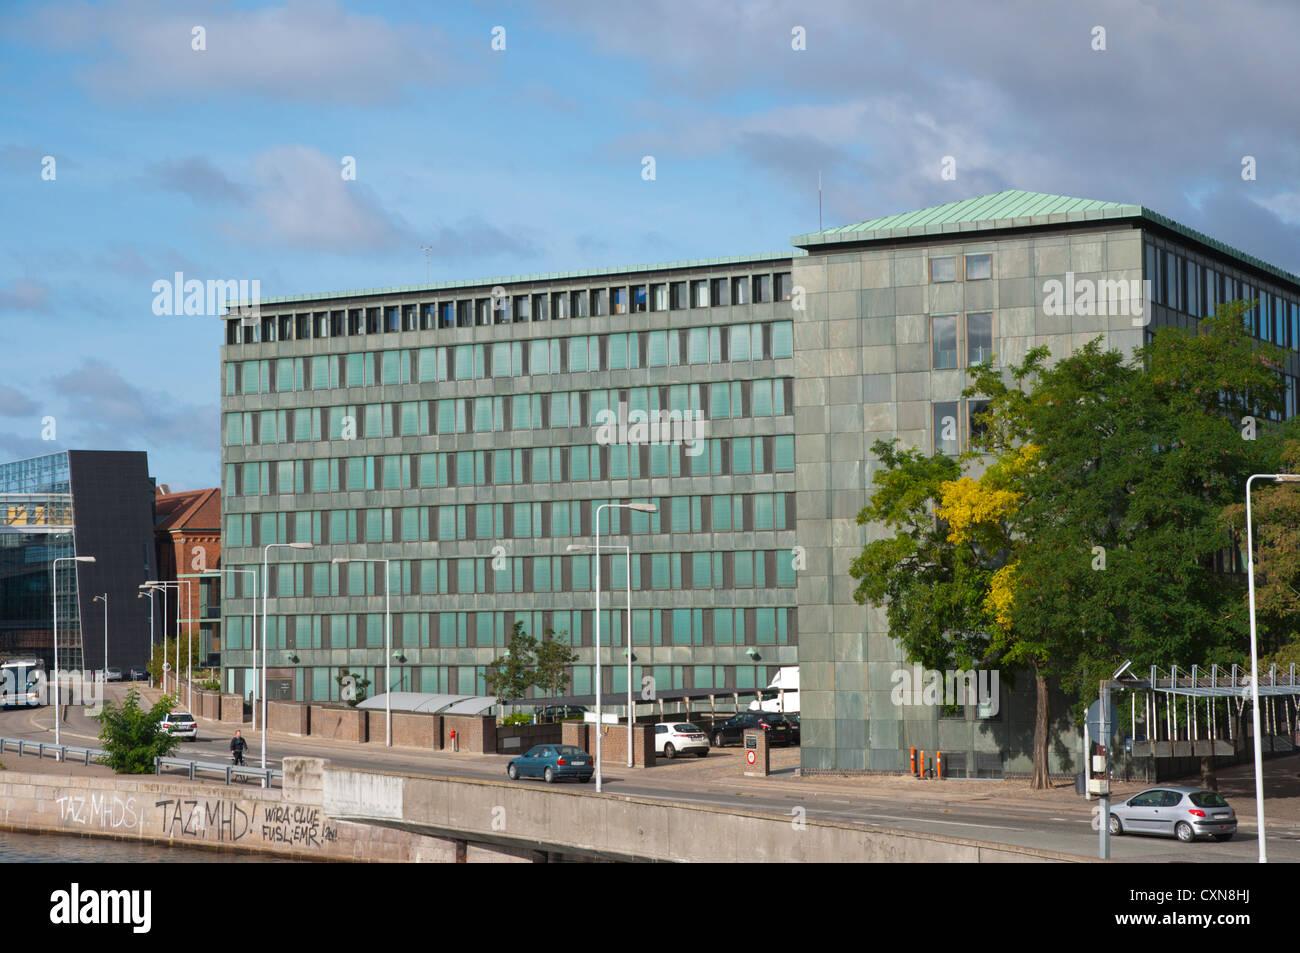 Government office buildings along Inderhavn canal at Slottsholmen island central Copenhagen Denmark Europe - Stock Image